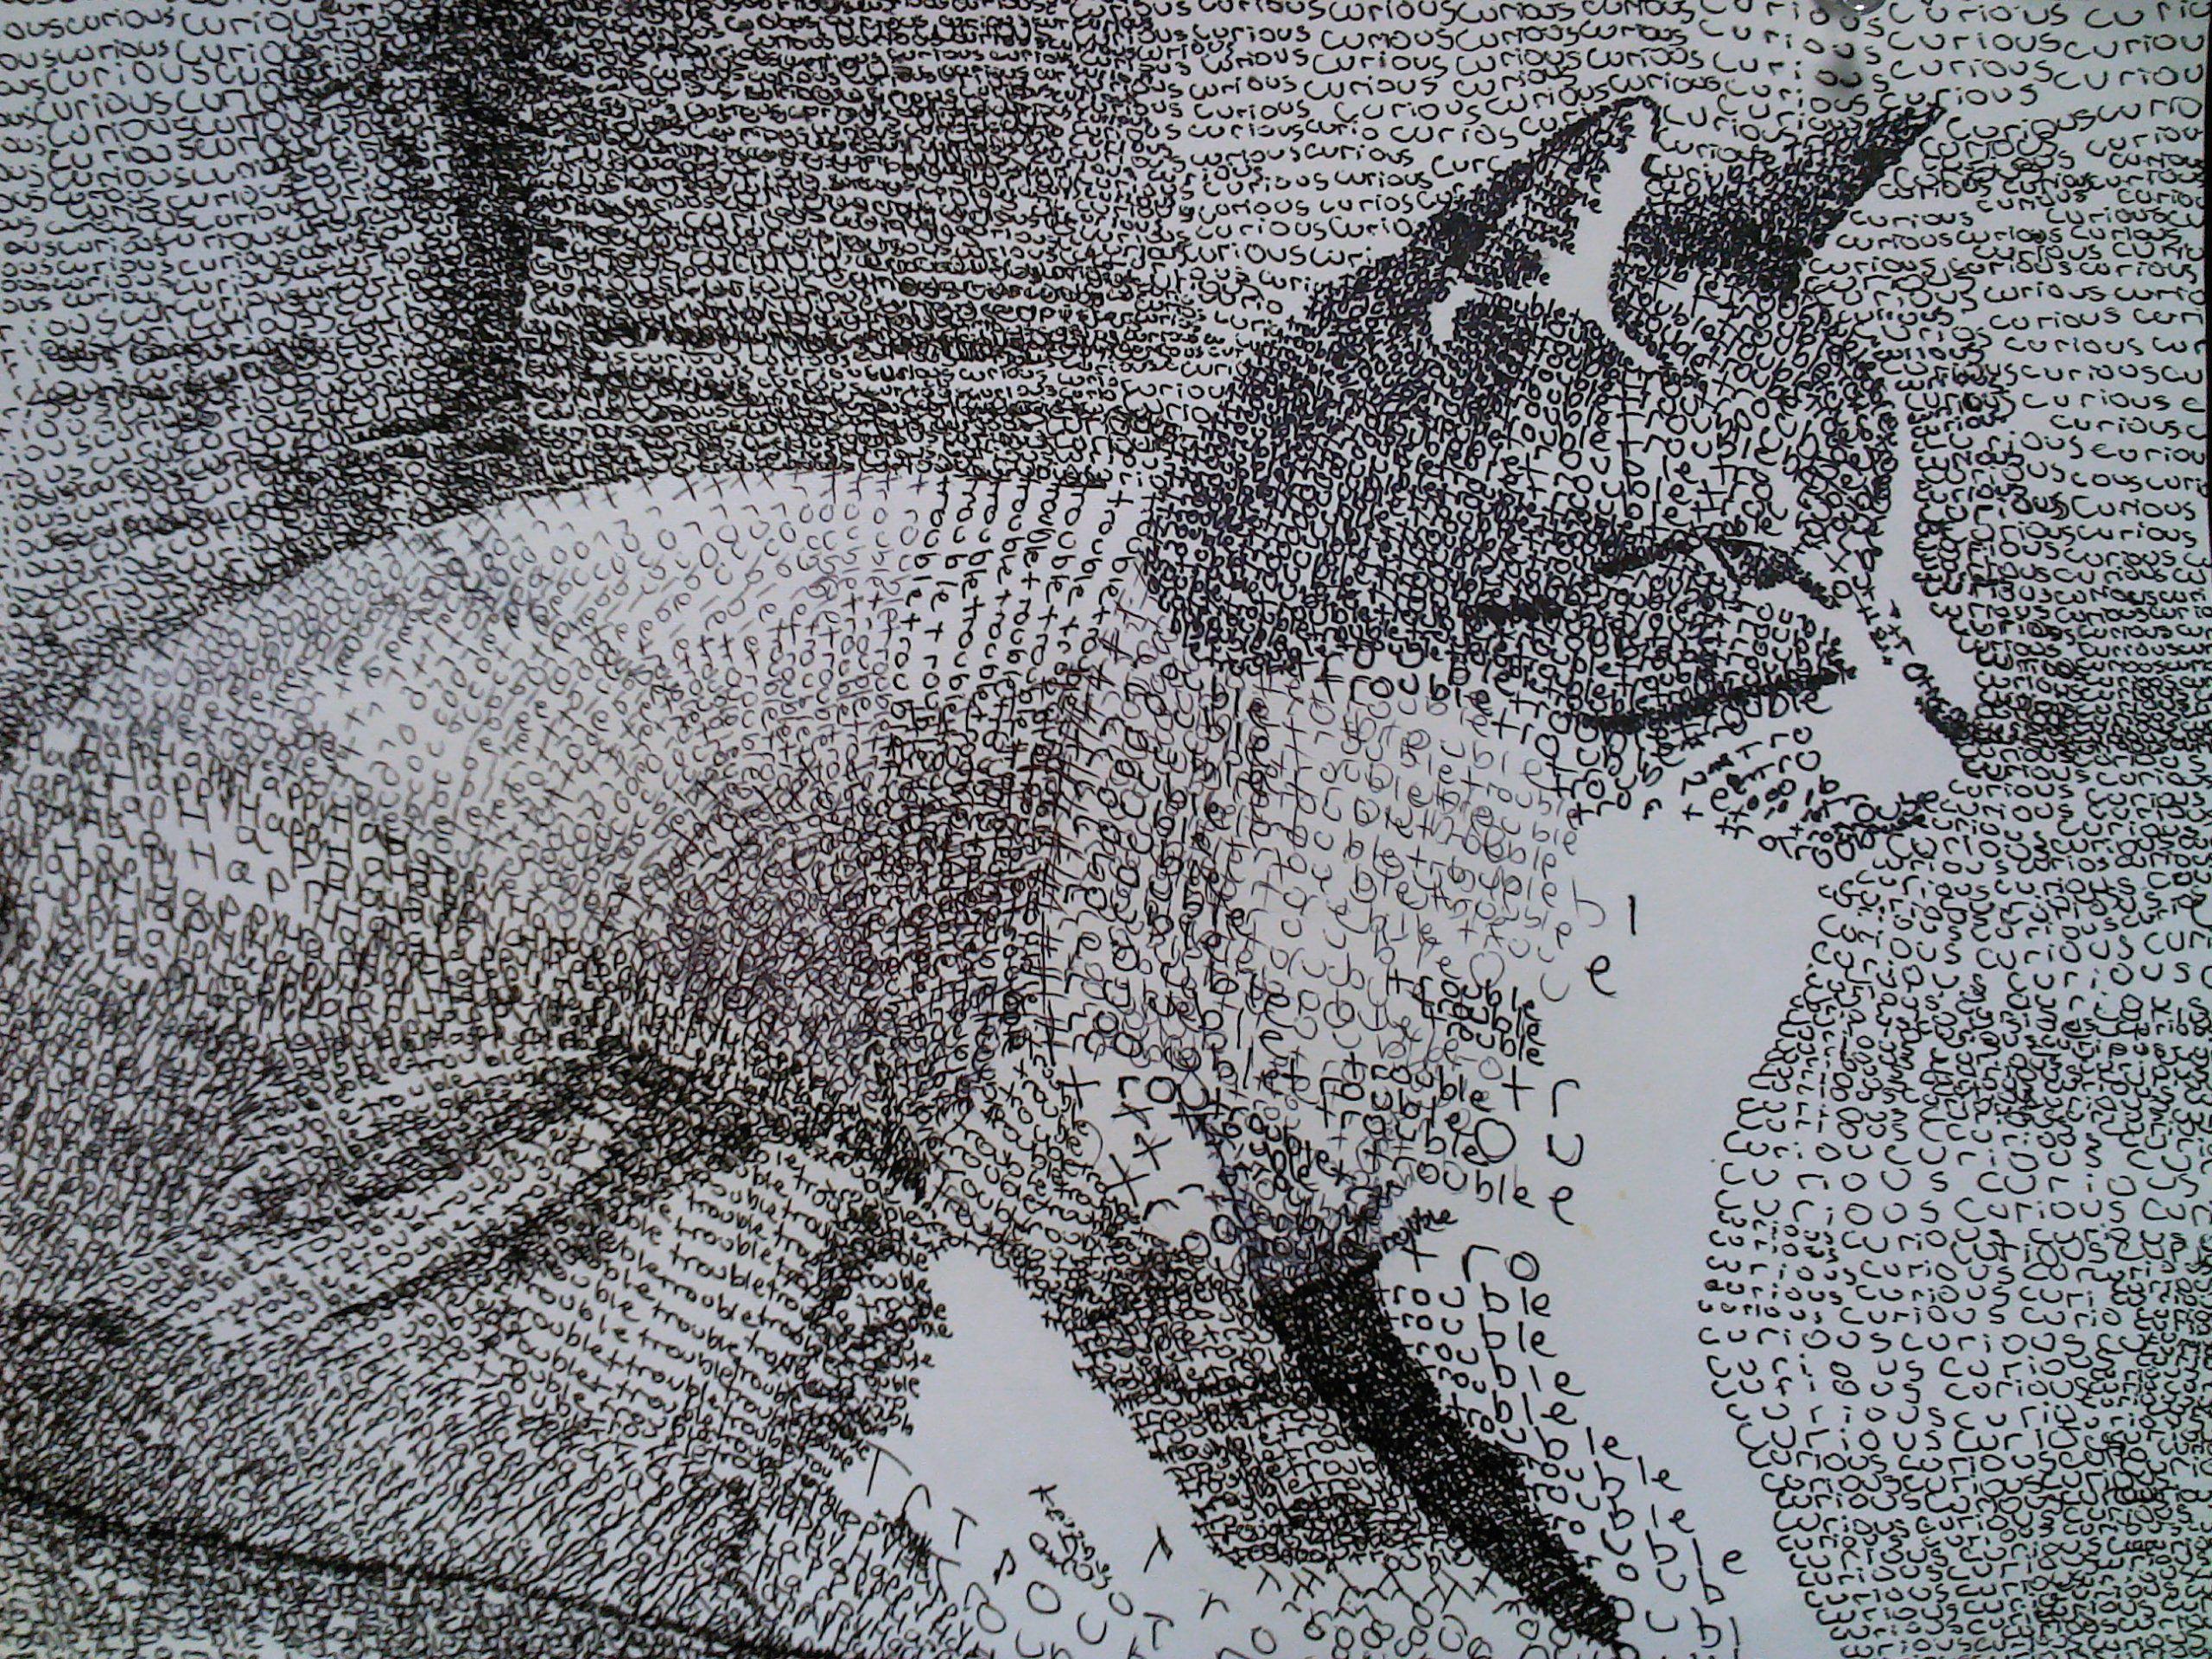 micrography high school drawing class 8 year 8 ap art arts ed